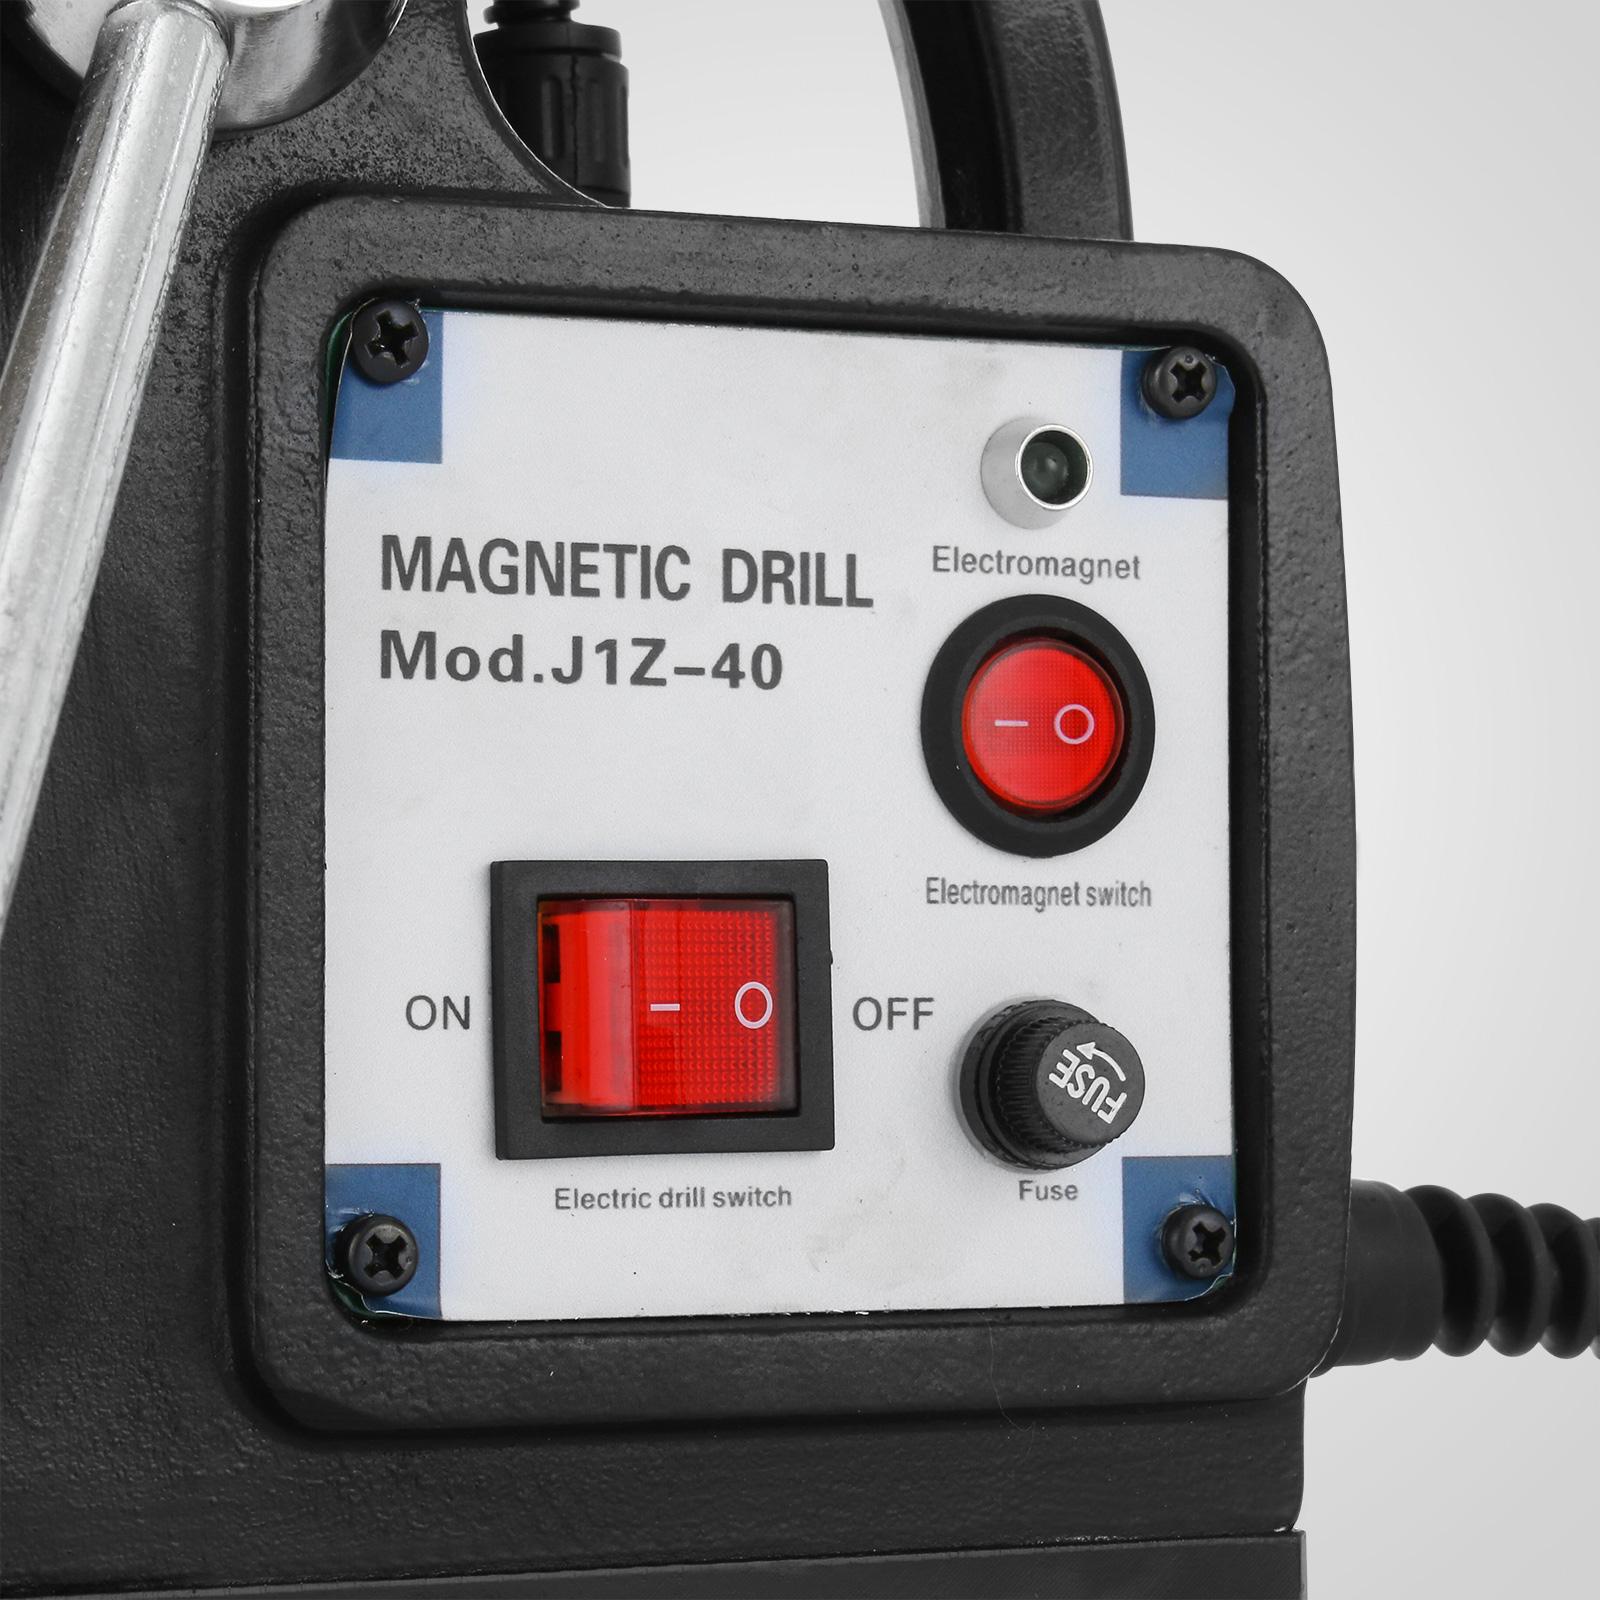 MB23-BRM35-MD40-Trapano-Perforatrice-Carotatore-Fresa-Magnetico-12-40mm-230V miniatura 21